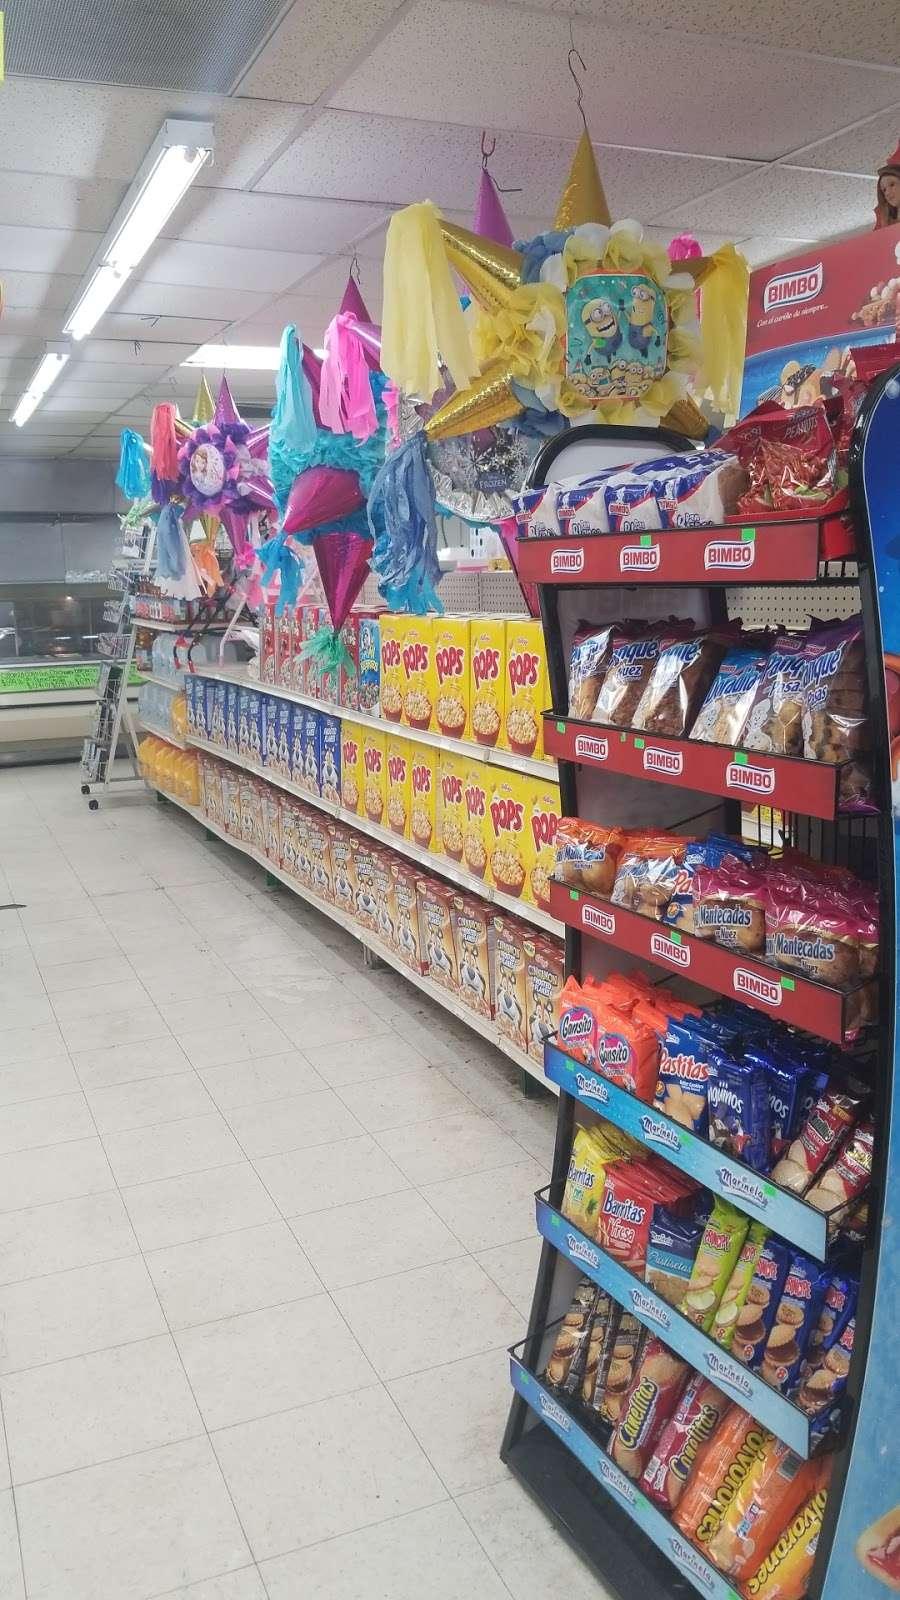 Latino Market - convenience store  | Photo 10 of 10 | Address: 7806 N 27th Ave, Phoenix, AZ 85051, USA | Phone: (602) 973-5326